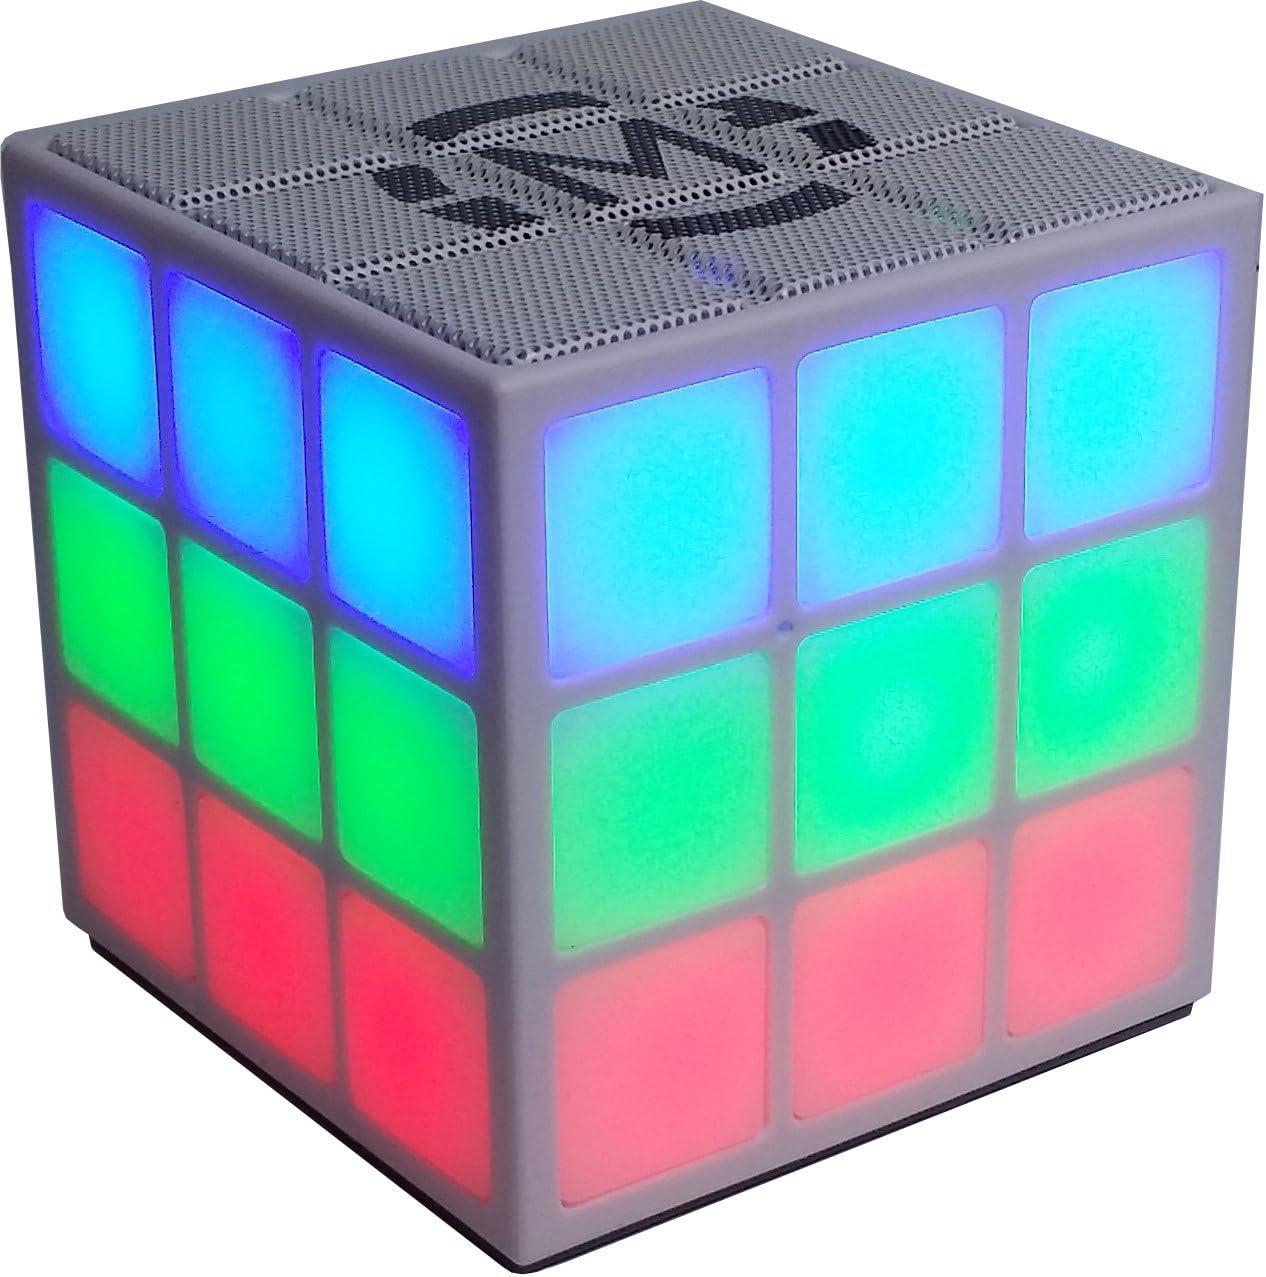 Mobi Cube Bluetooth Speaker